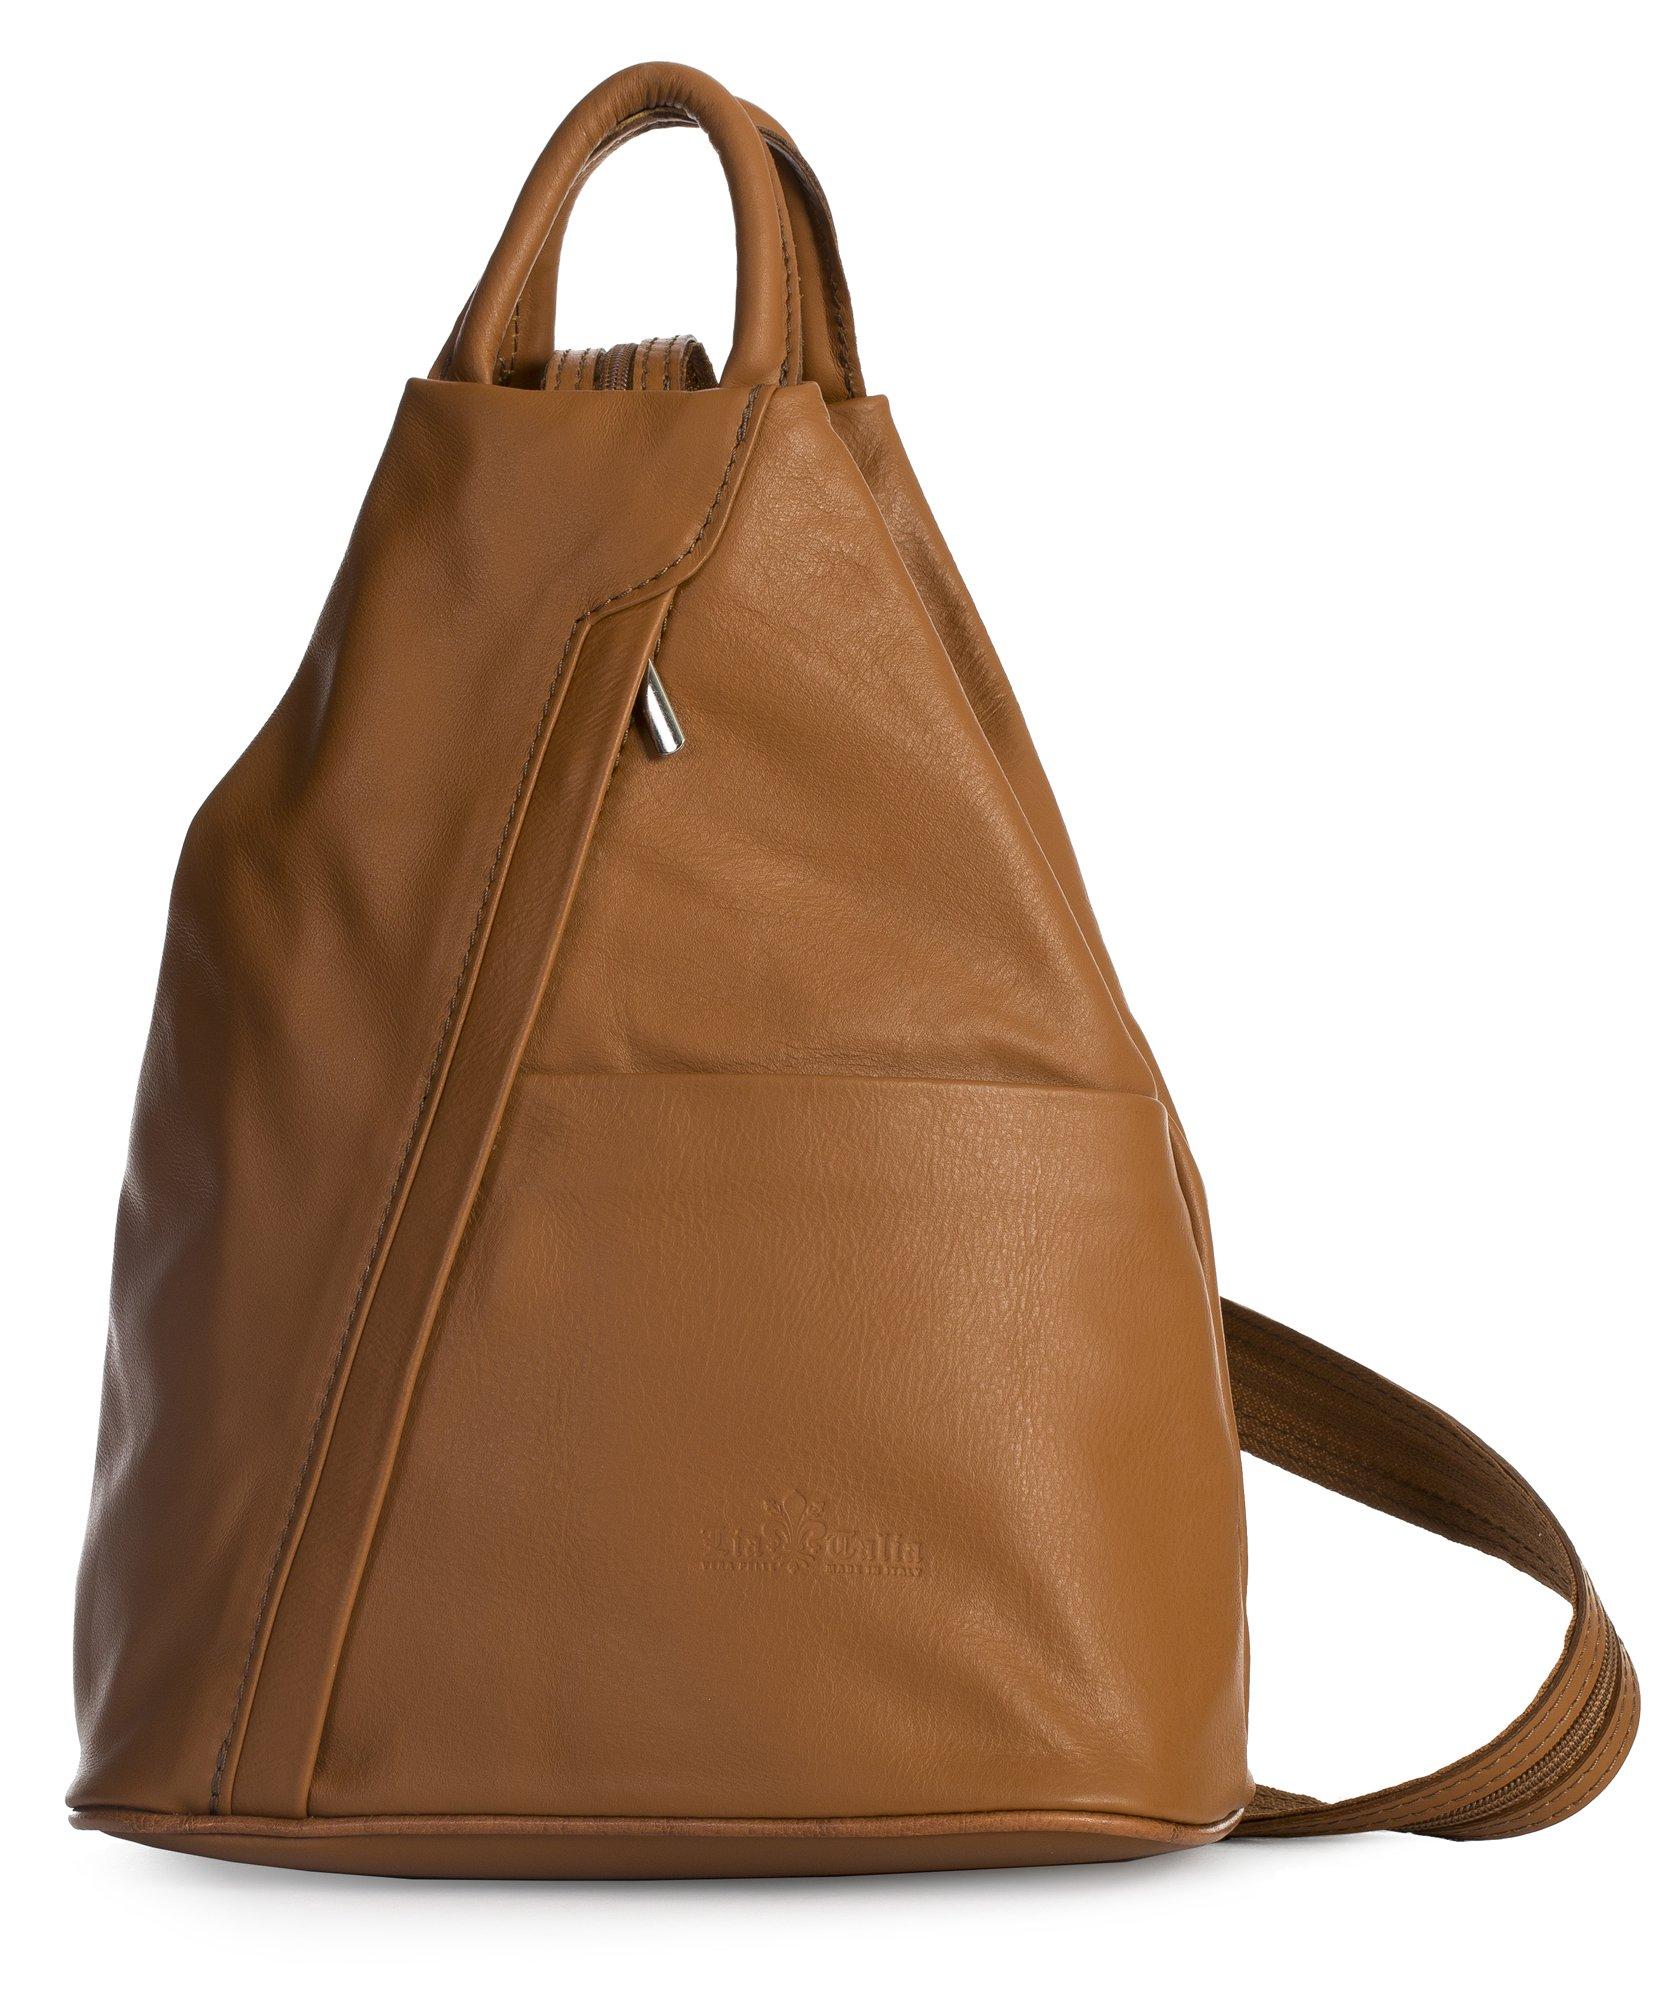 LiaTalia Unisex Soft Italian Leather Convertible Strap Small Backpack Rucksack Duffle Bag - Alex [Medium Tan]